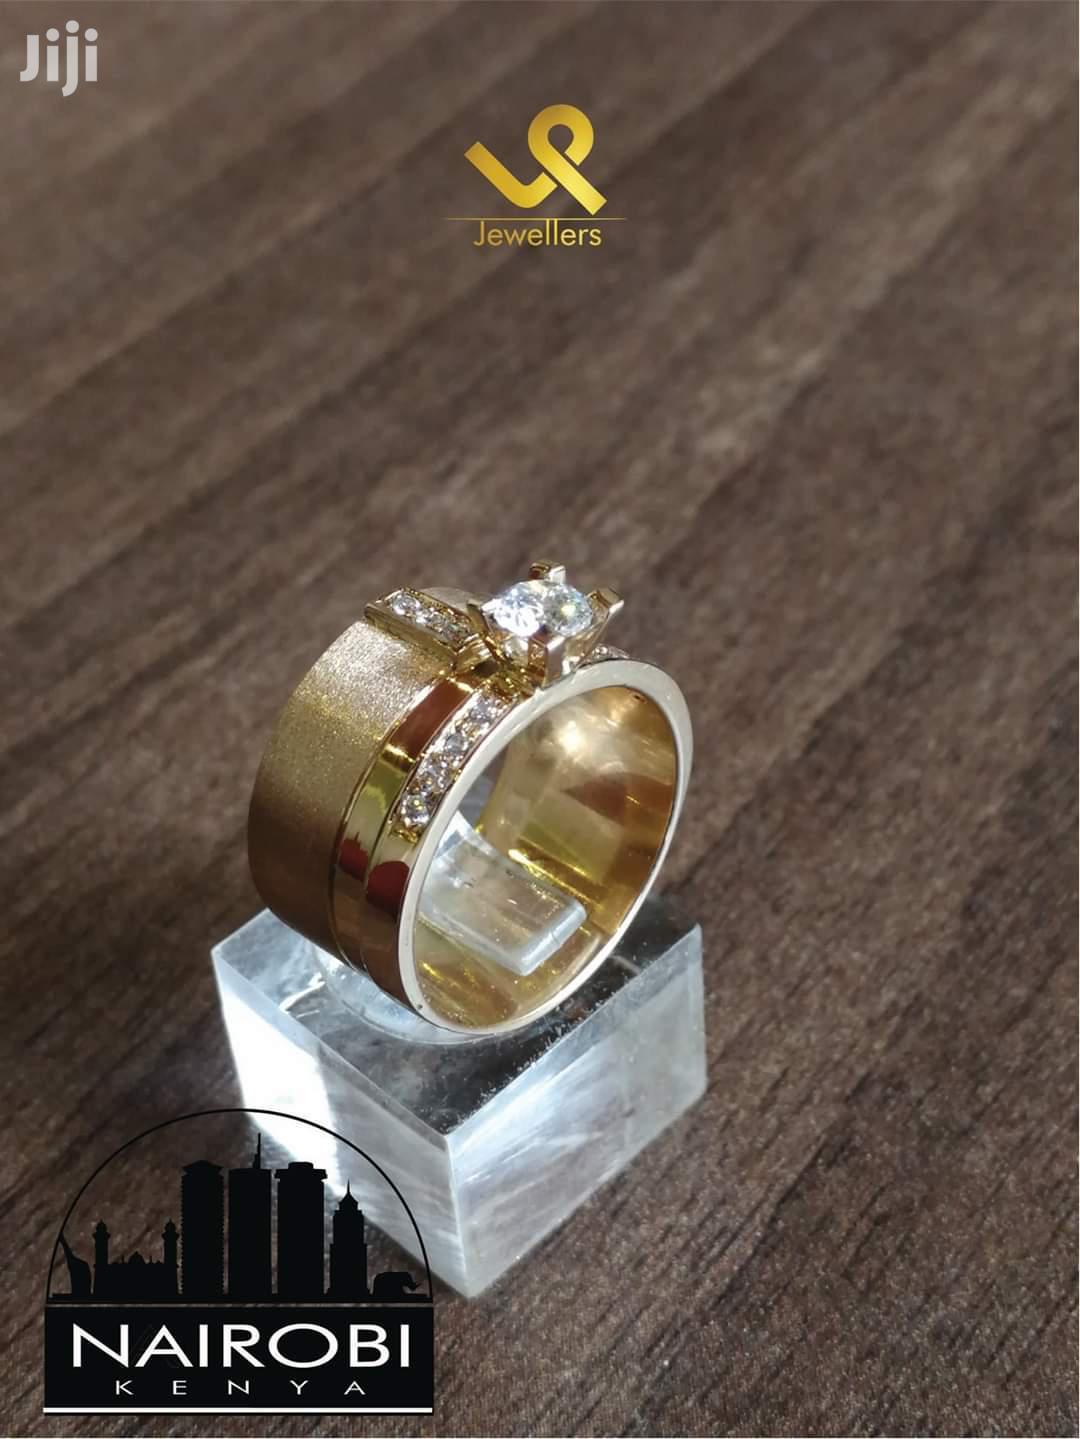 Ladies Bejewelled Engagement/Wedding Ring 18k Gold Custom Made. 12mm